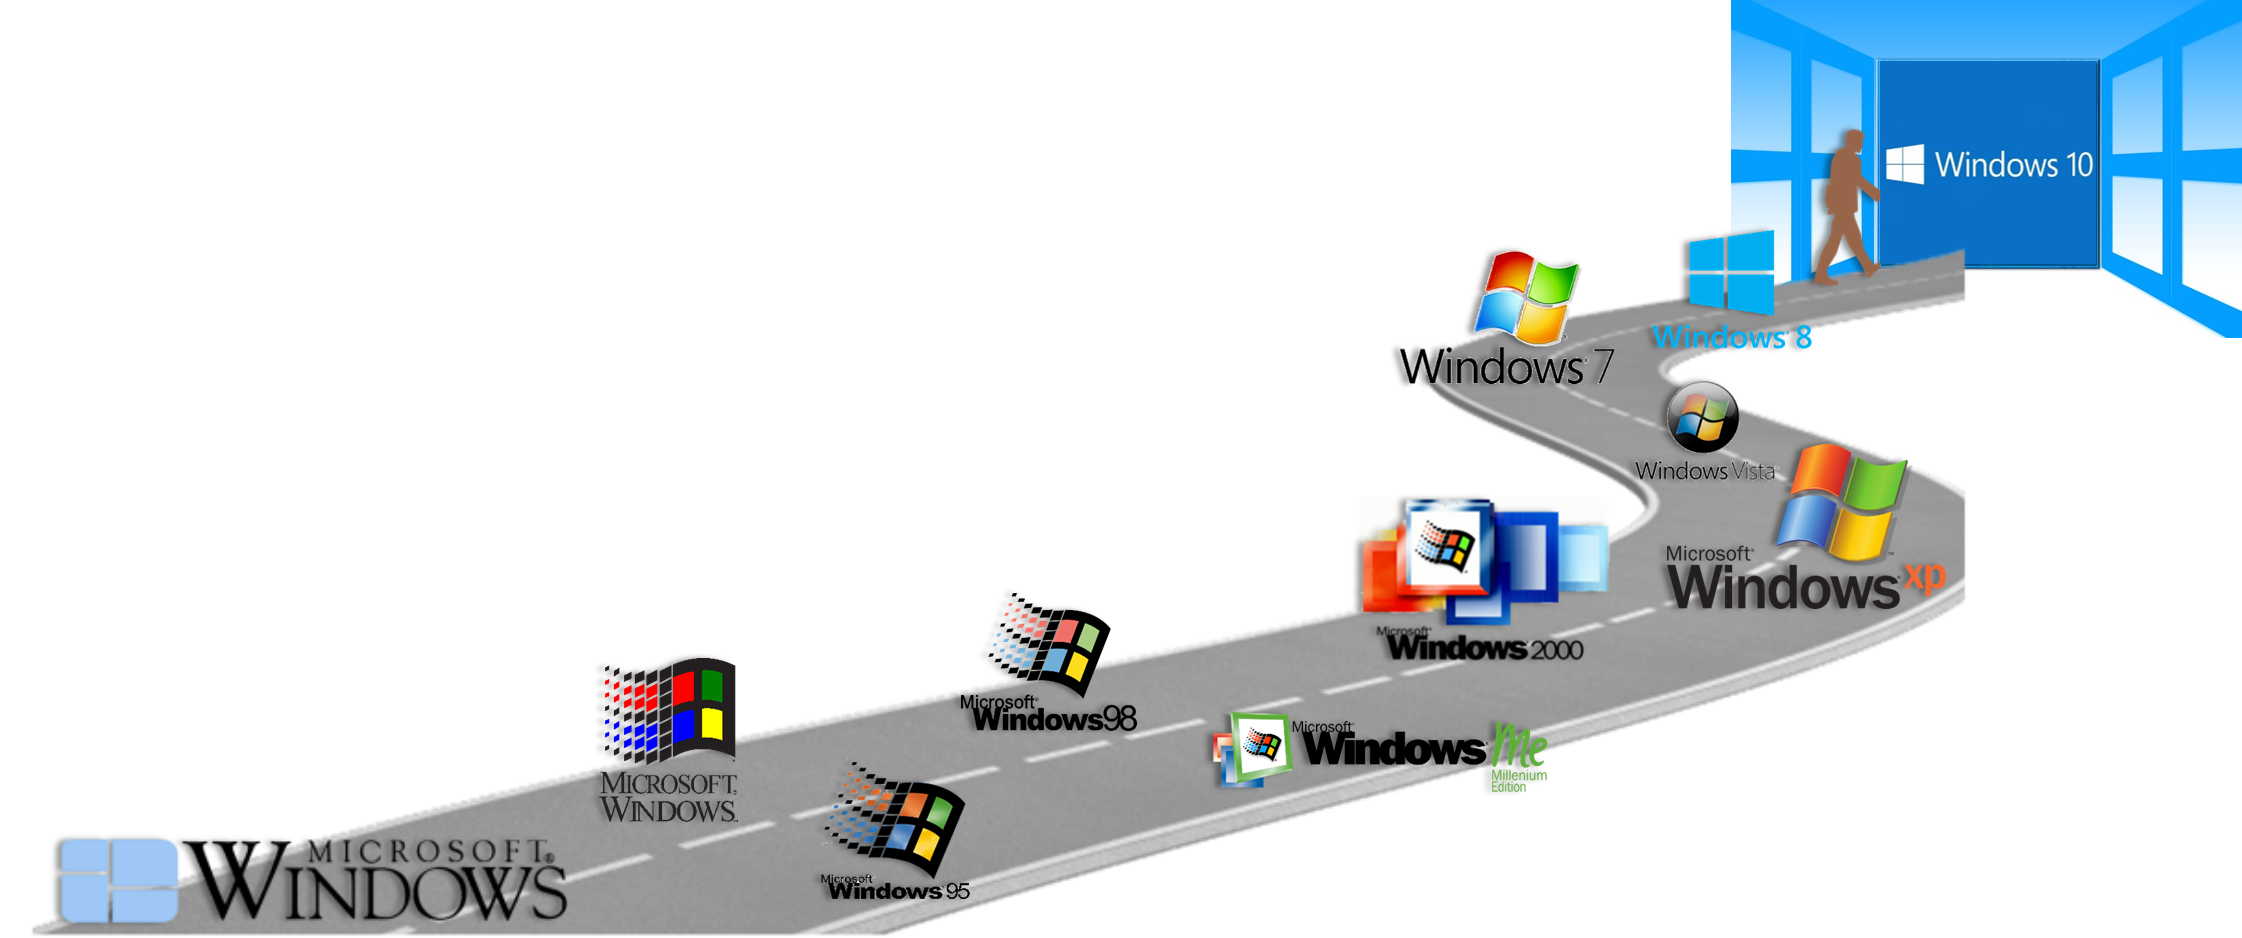 When do we see you on Windows 10? – itblogsogeti